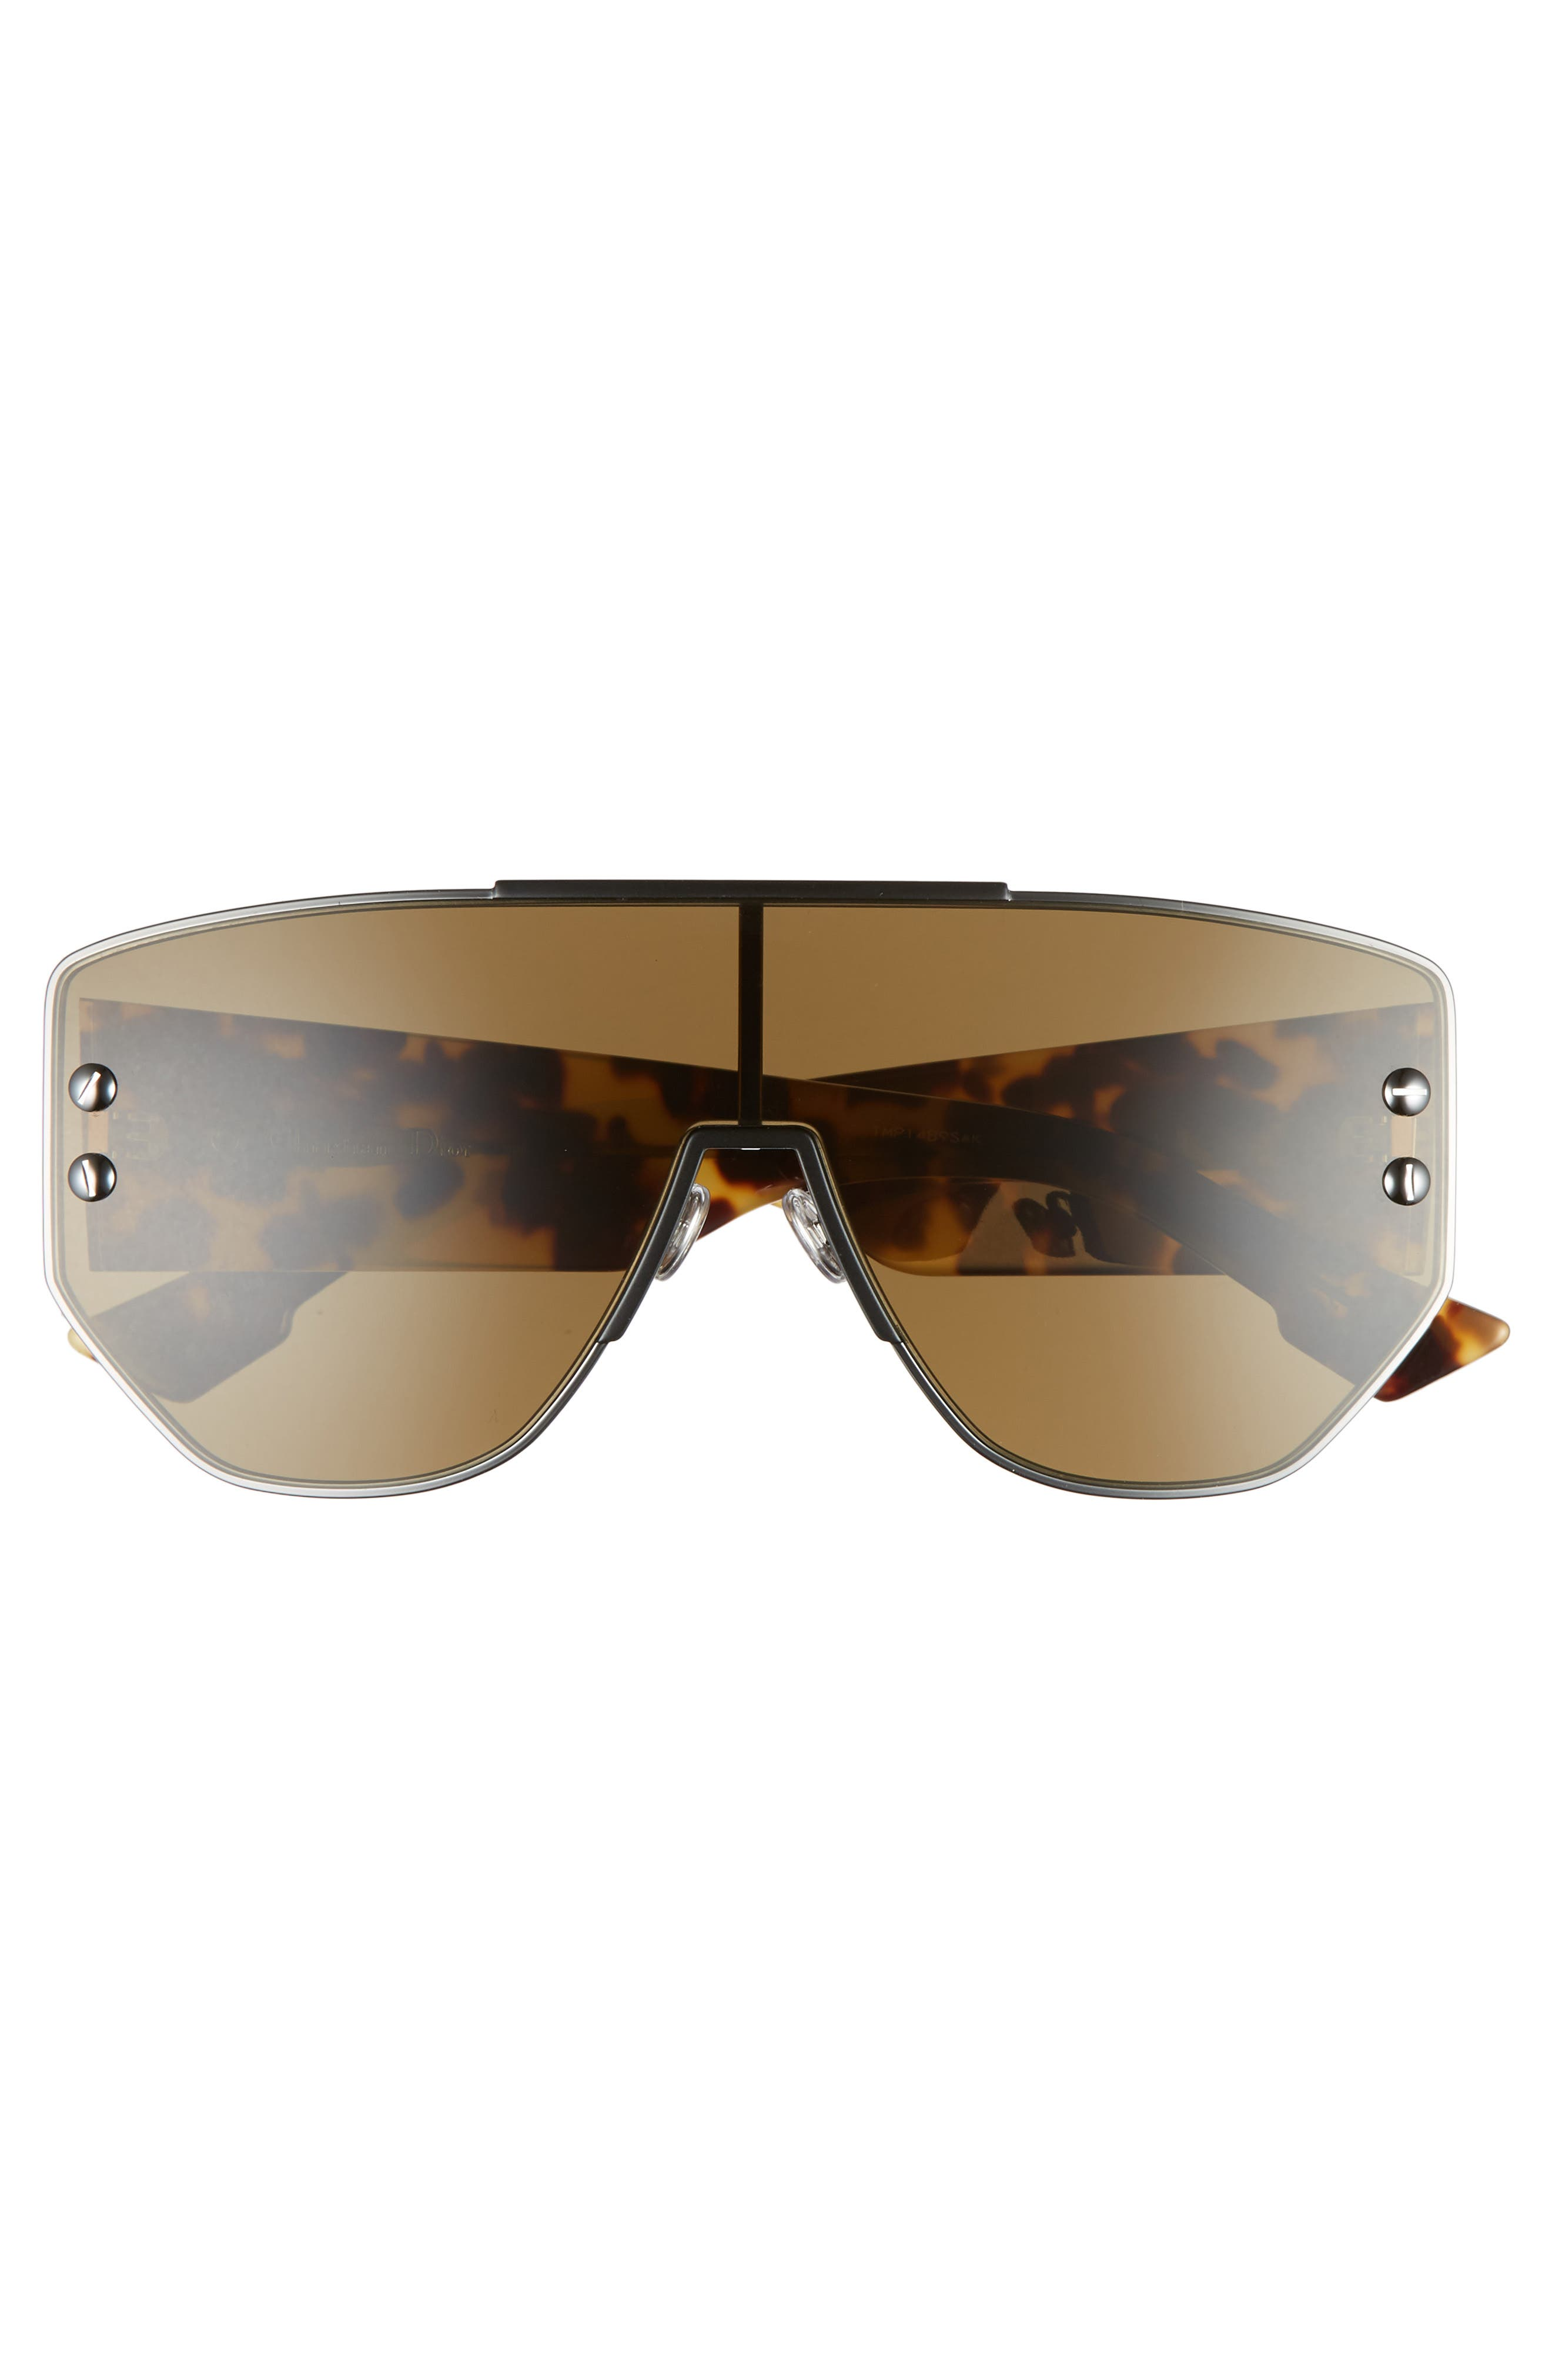 72mm Rimless Shield Sunglasses,                             Alternate thumbnail 3, color,                             Dark Ruthenium/ Black